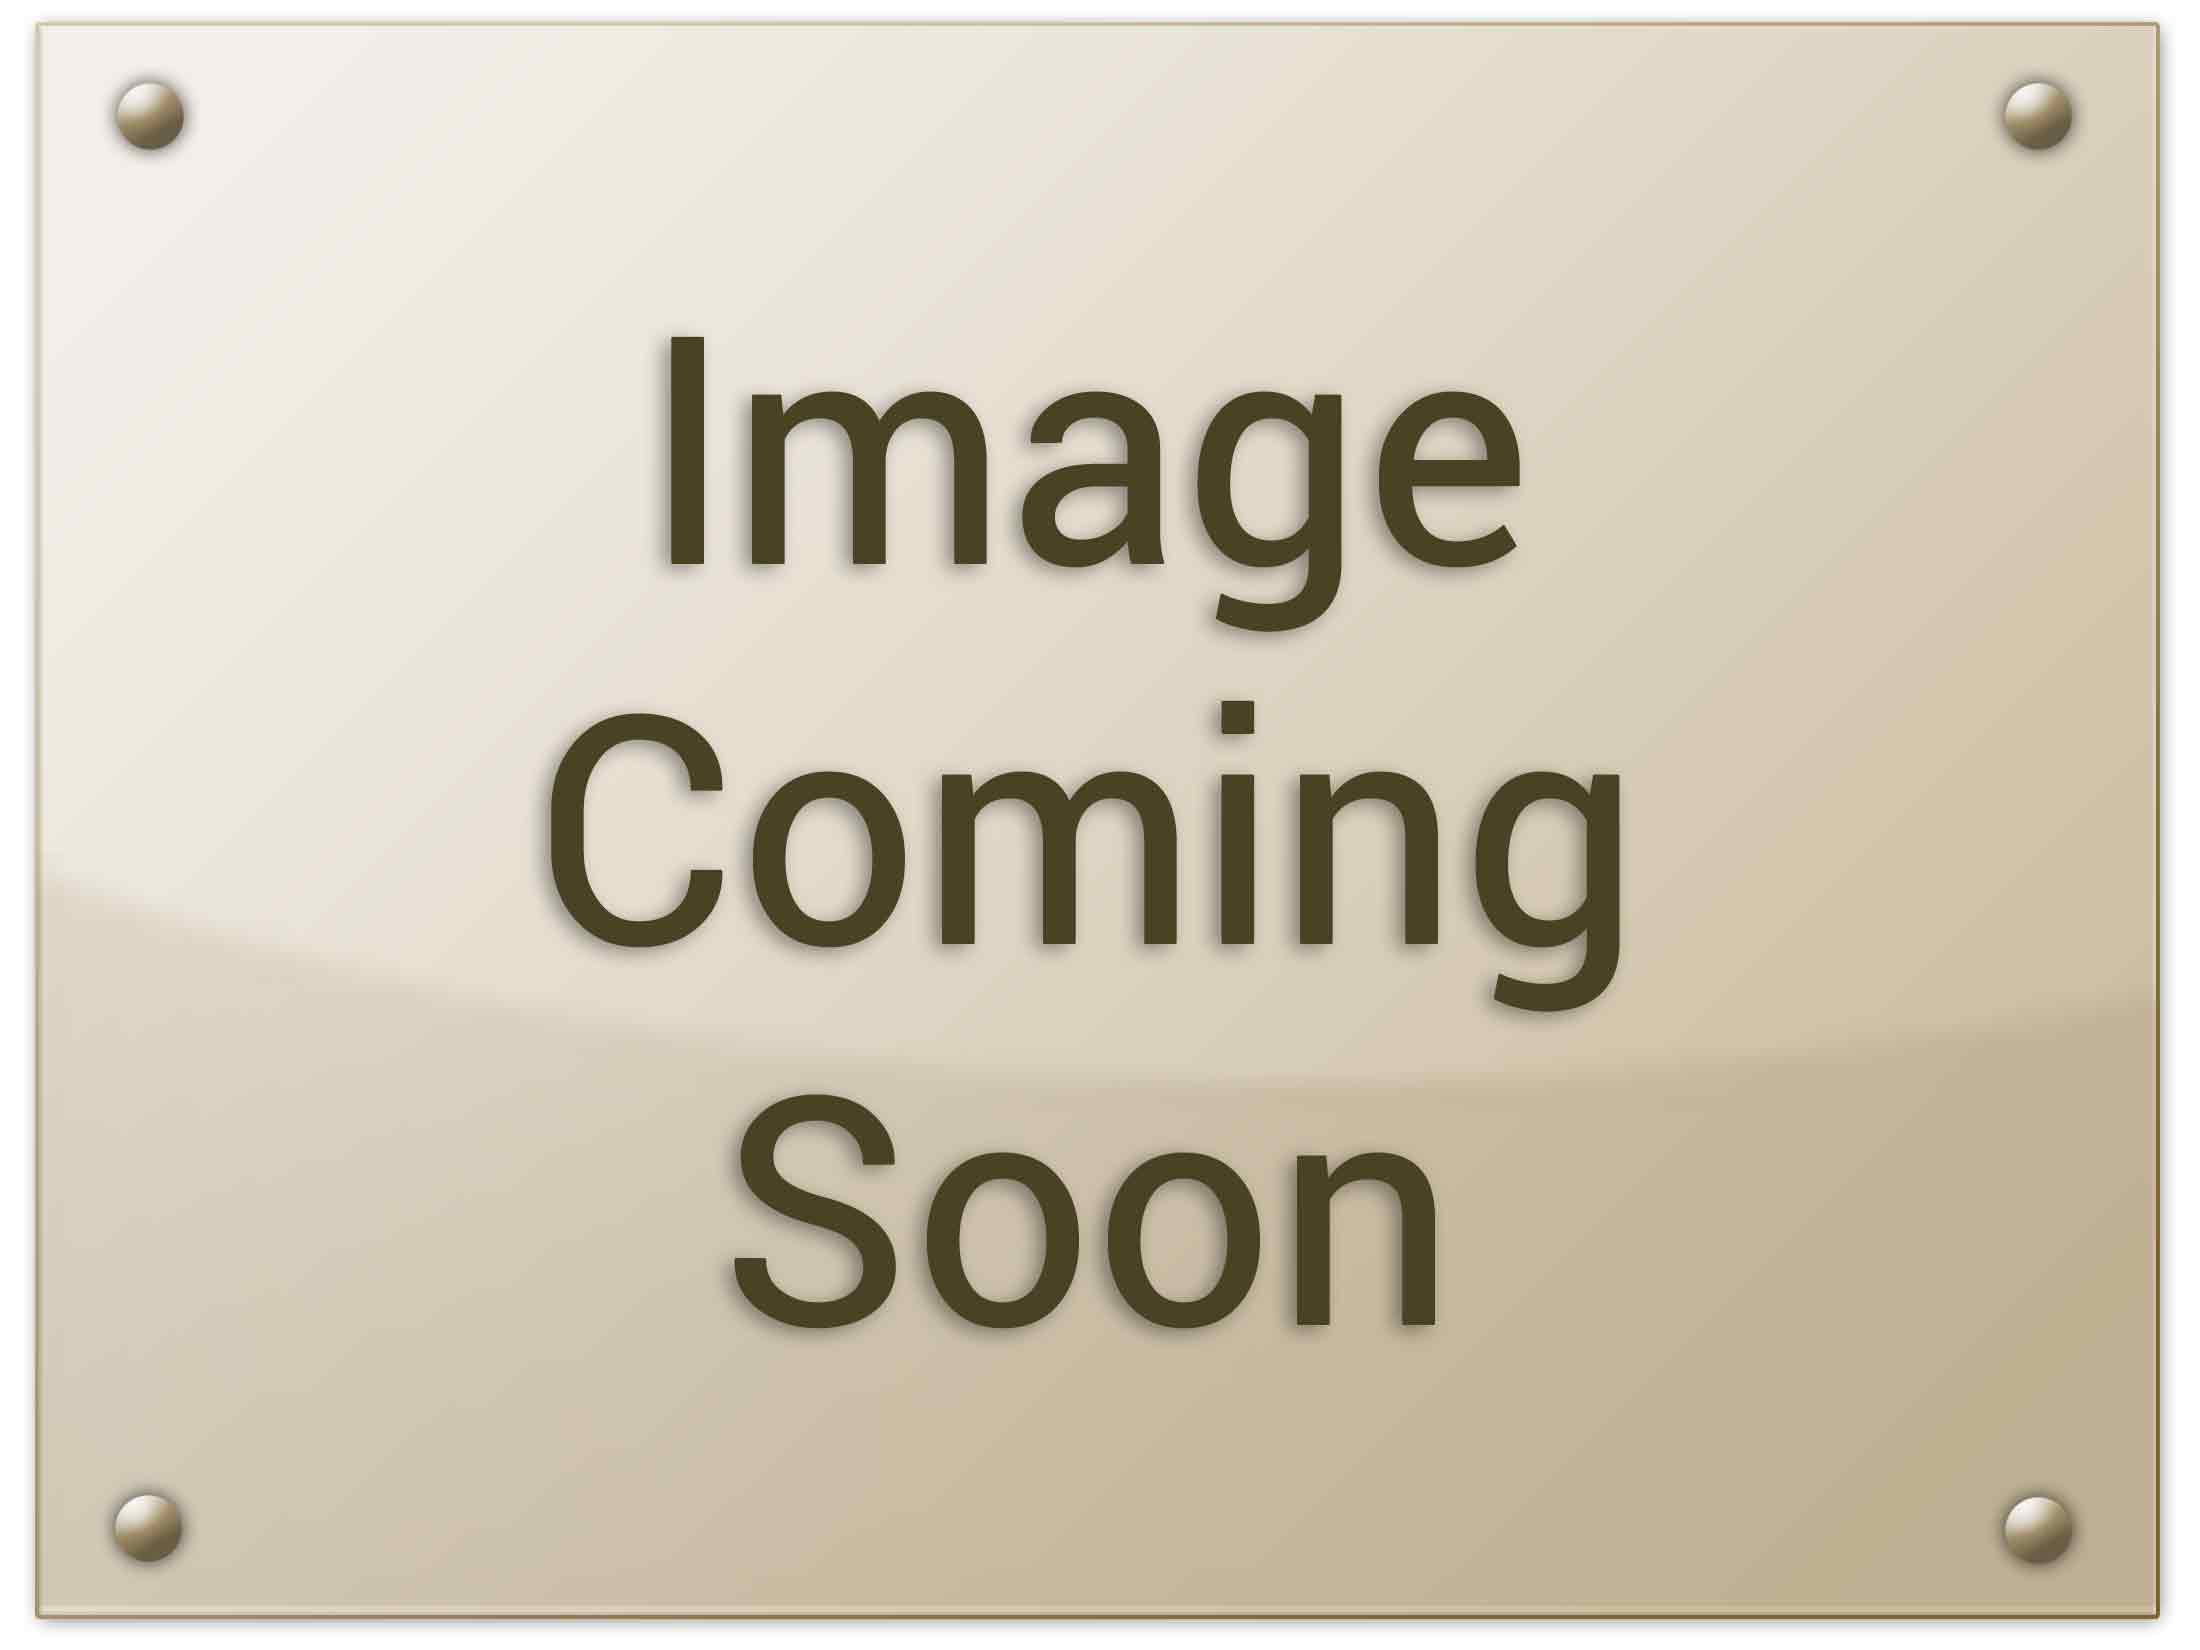 PTG Trigger Guard for AICS Detachable Box Magazine Howa 1500 Short Action  Aluminum Black